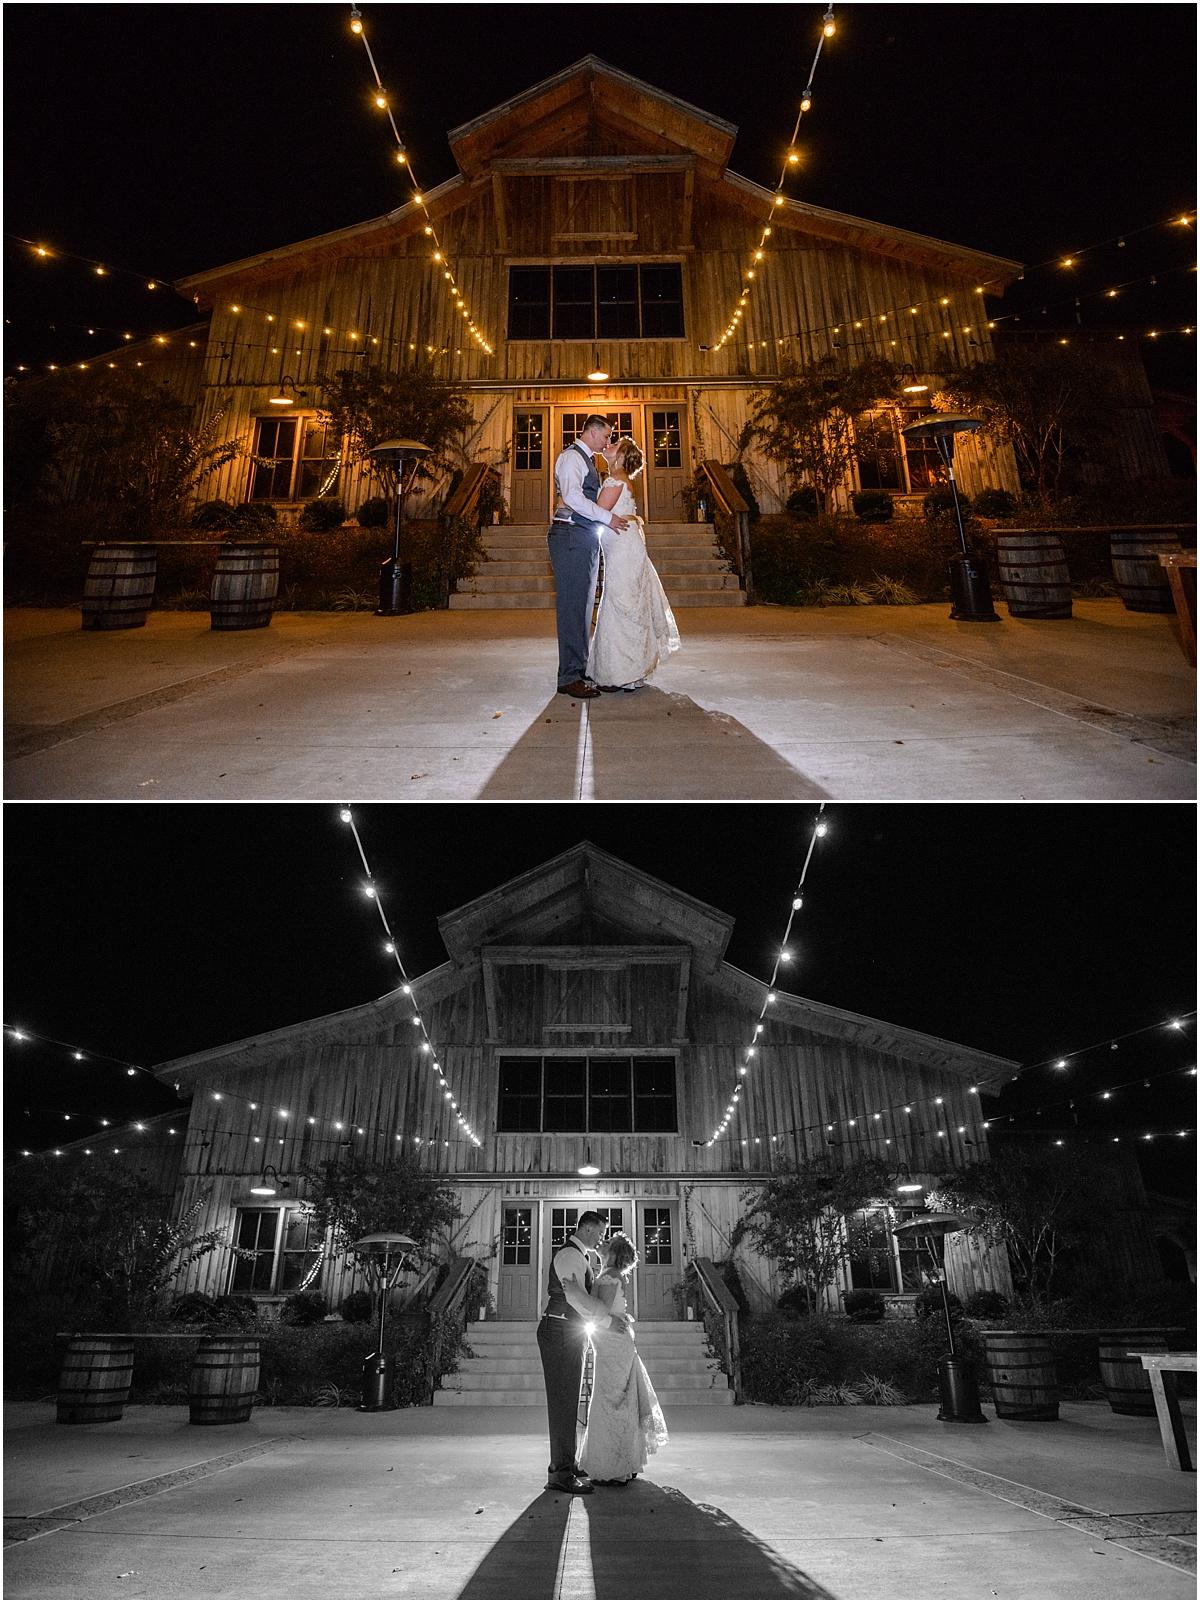 Greg Smit Photography Nashville wedding photographer Mint Springs Farm_0239